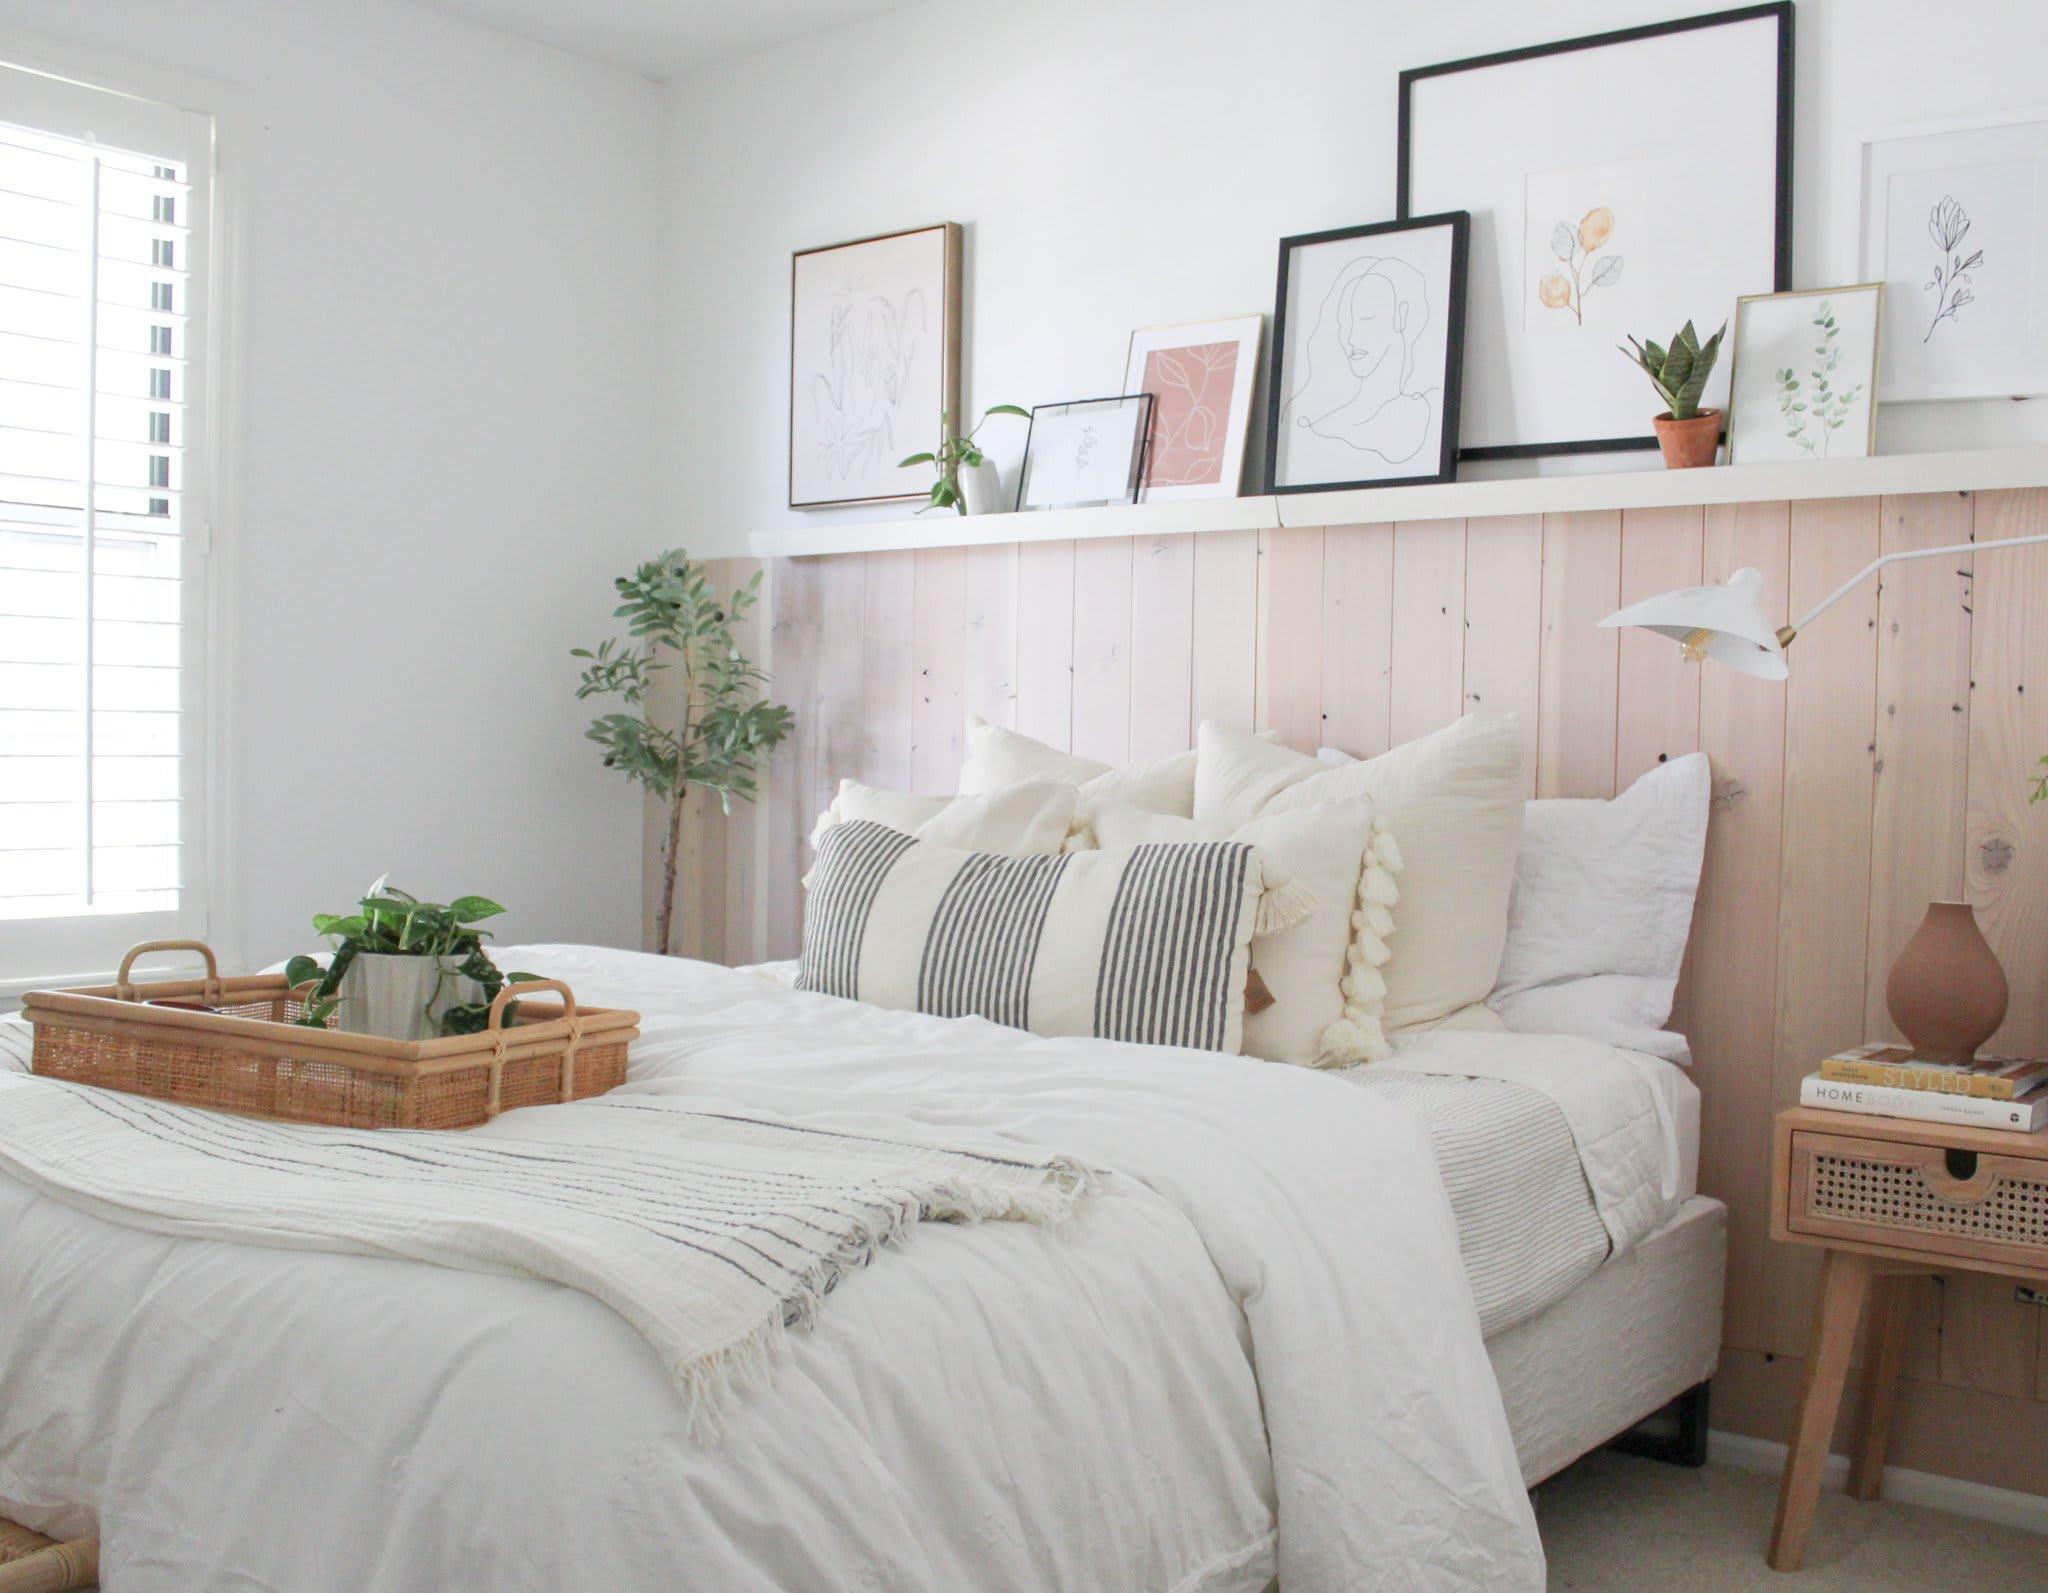 Stephanie Pohlman Designs bedroom design with a Stikwood minimalist fir reclaimed wood wainscot.